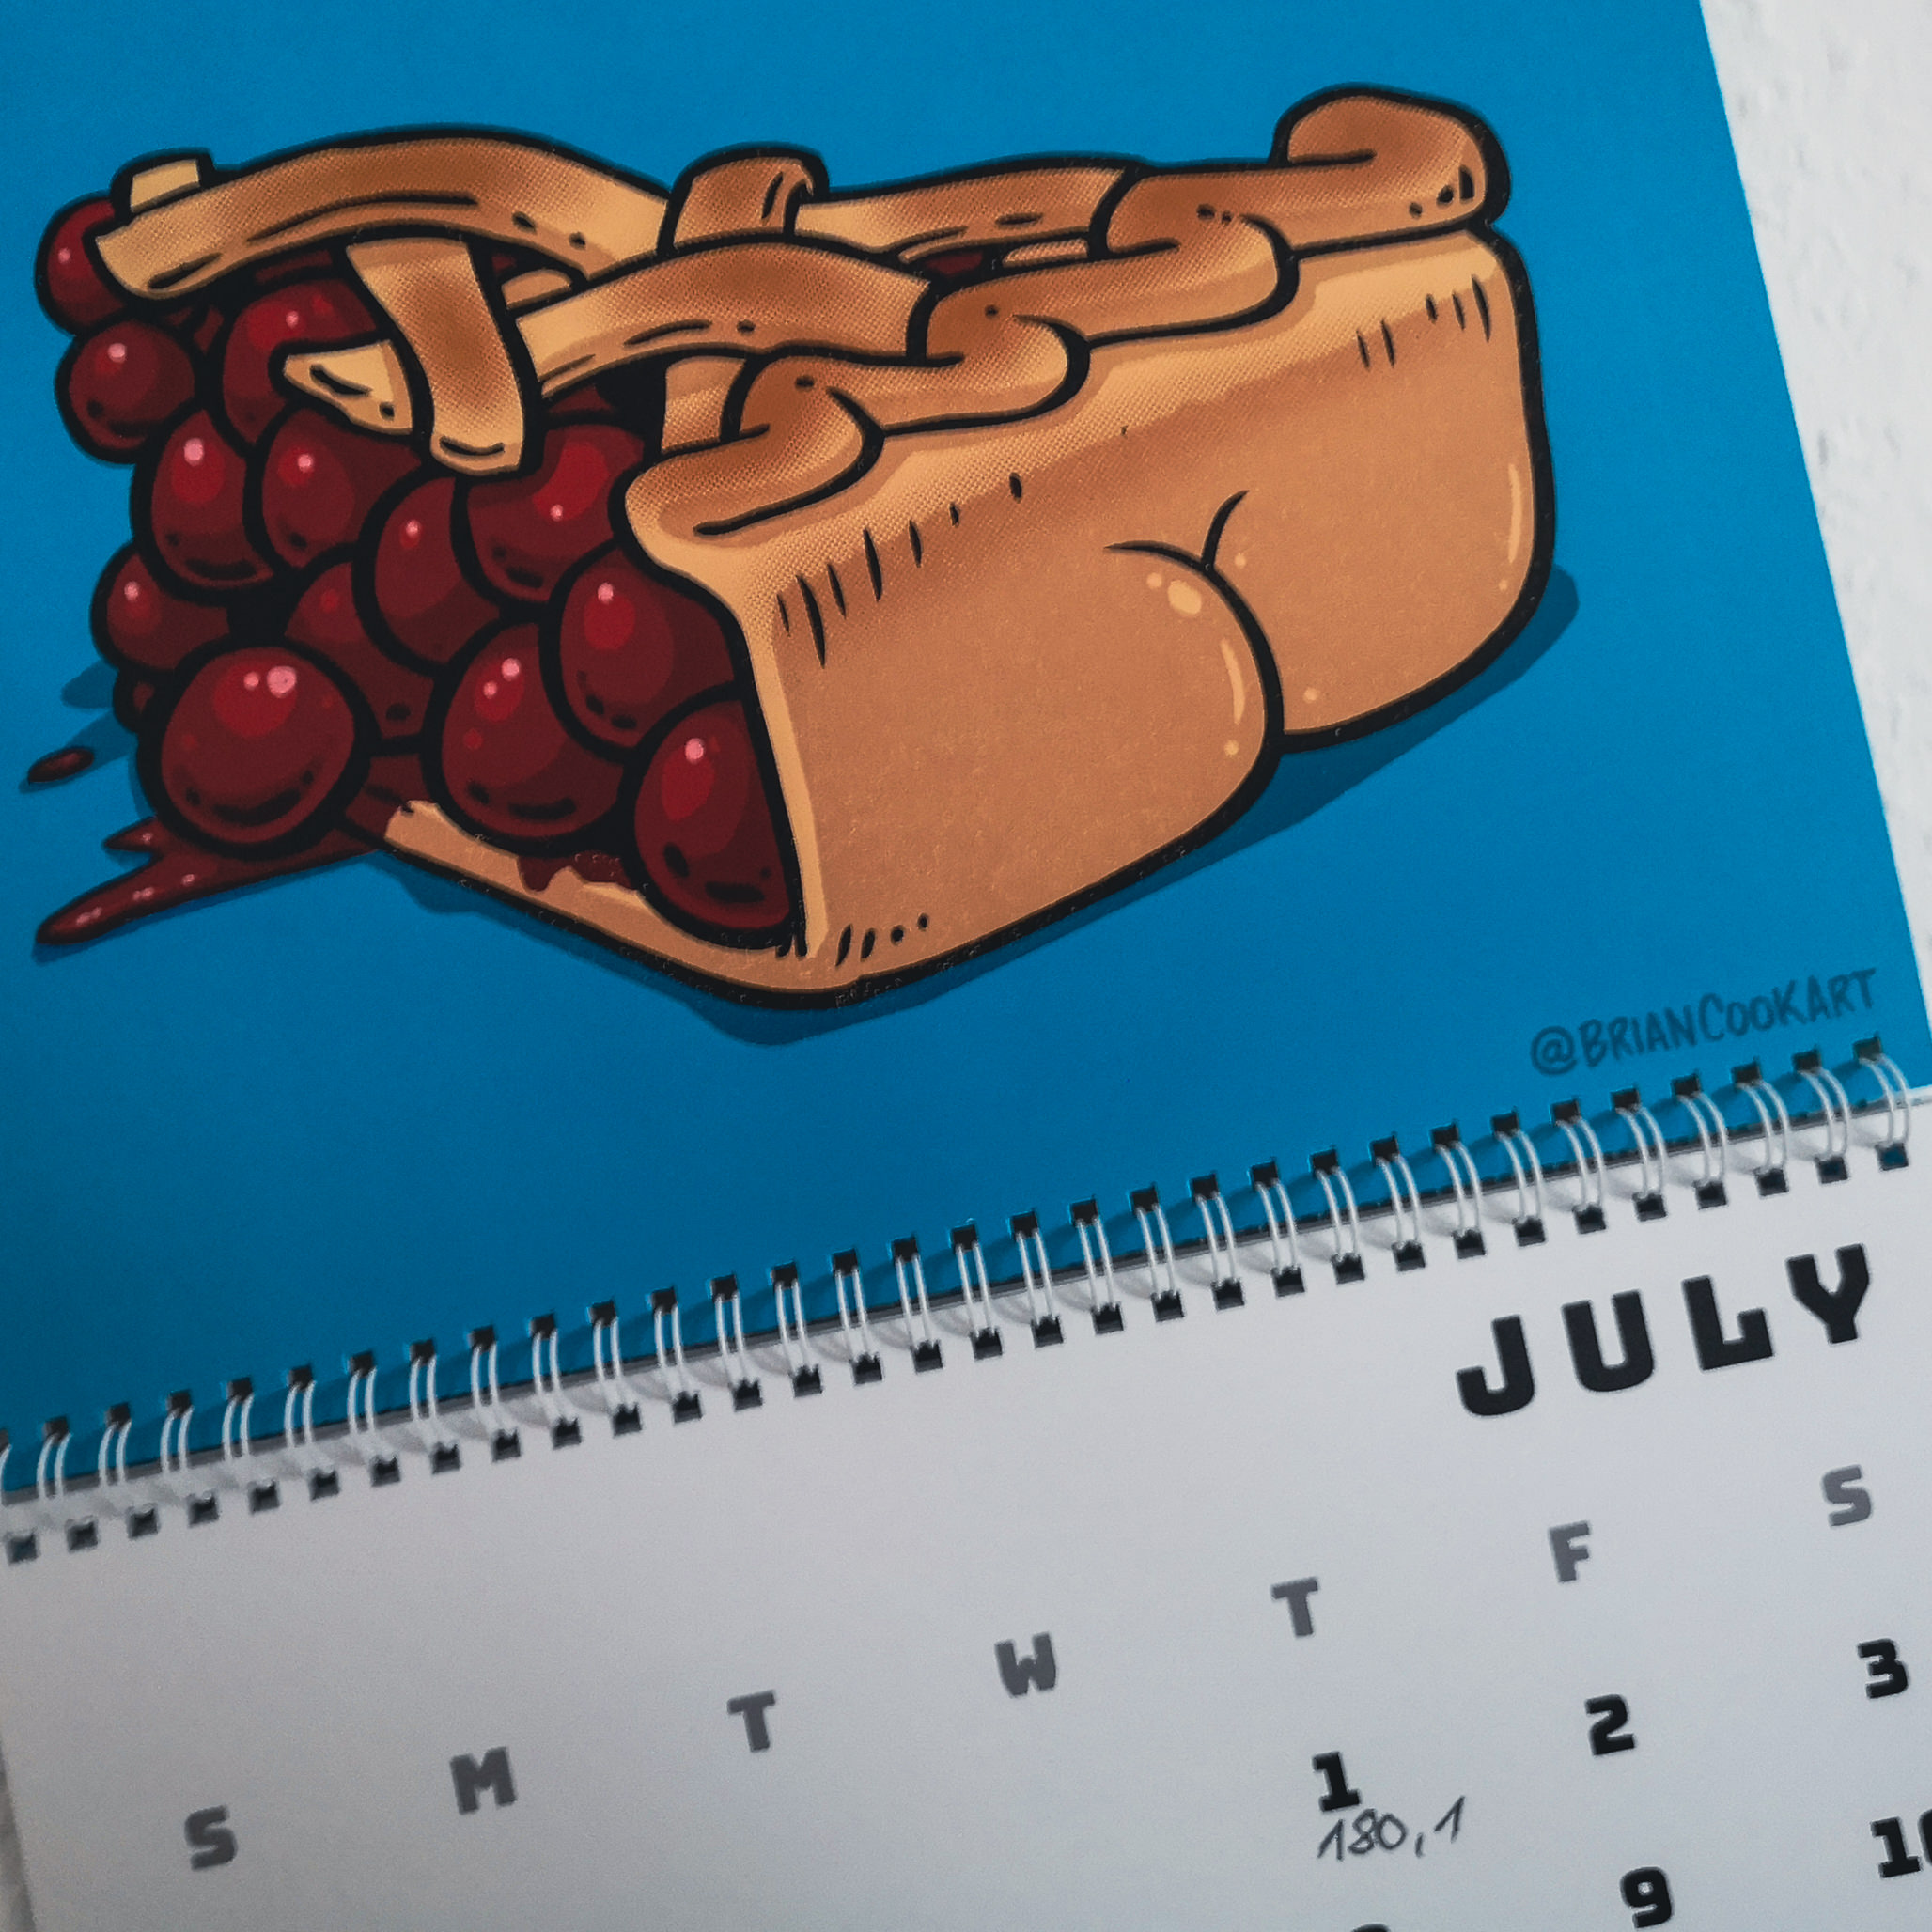 Kalender Butts on Things Brian Cook - Gewichtsupdate Juli 2021